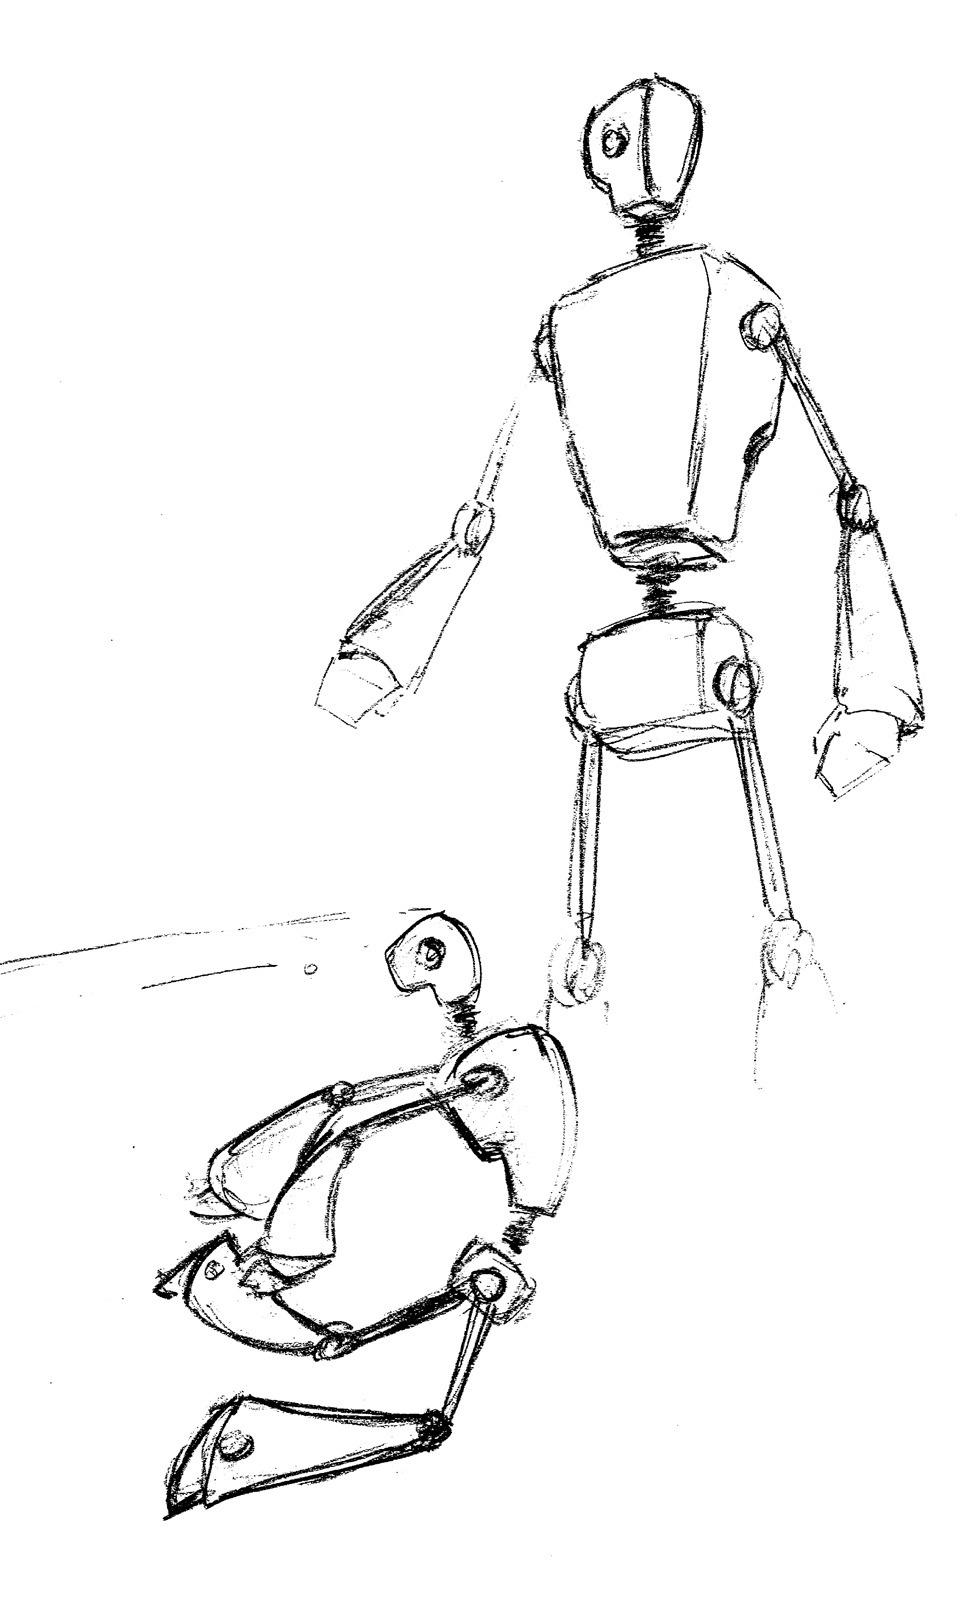 Robotjoe sketch show